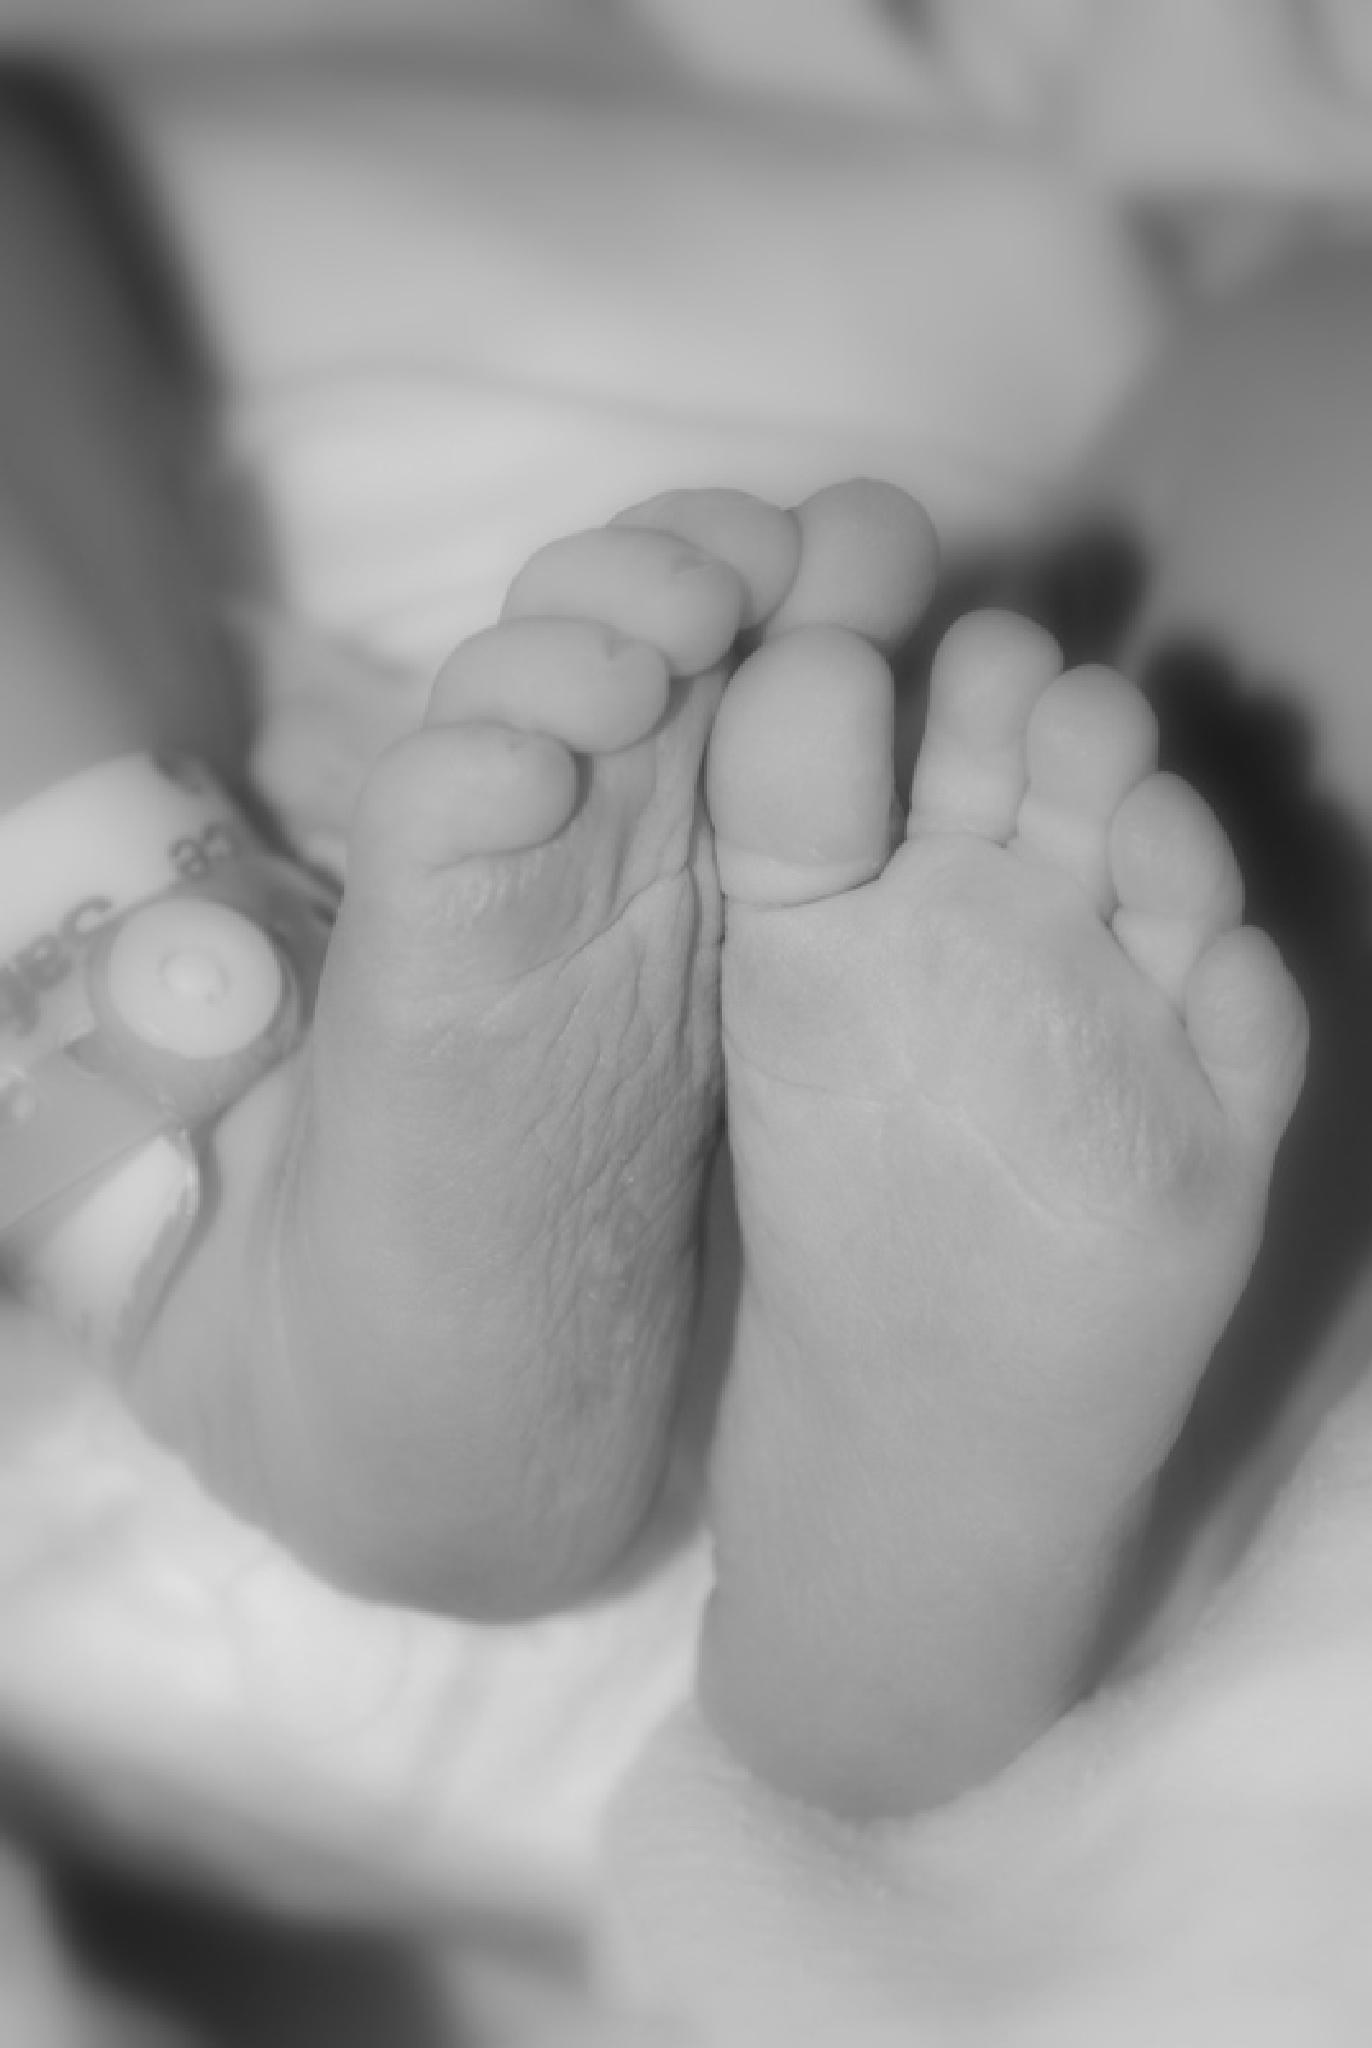 Little Feet by Shannon Smith